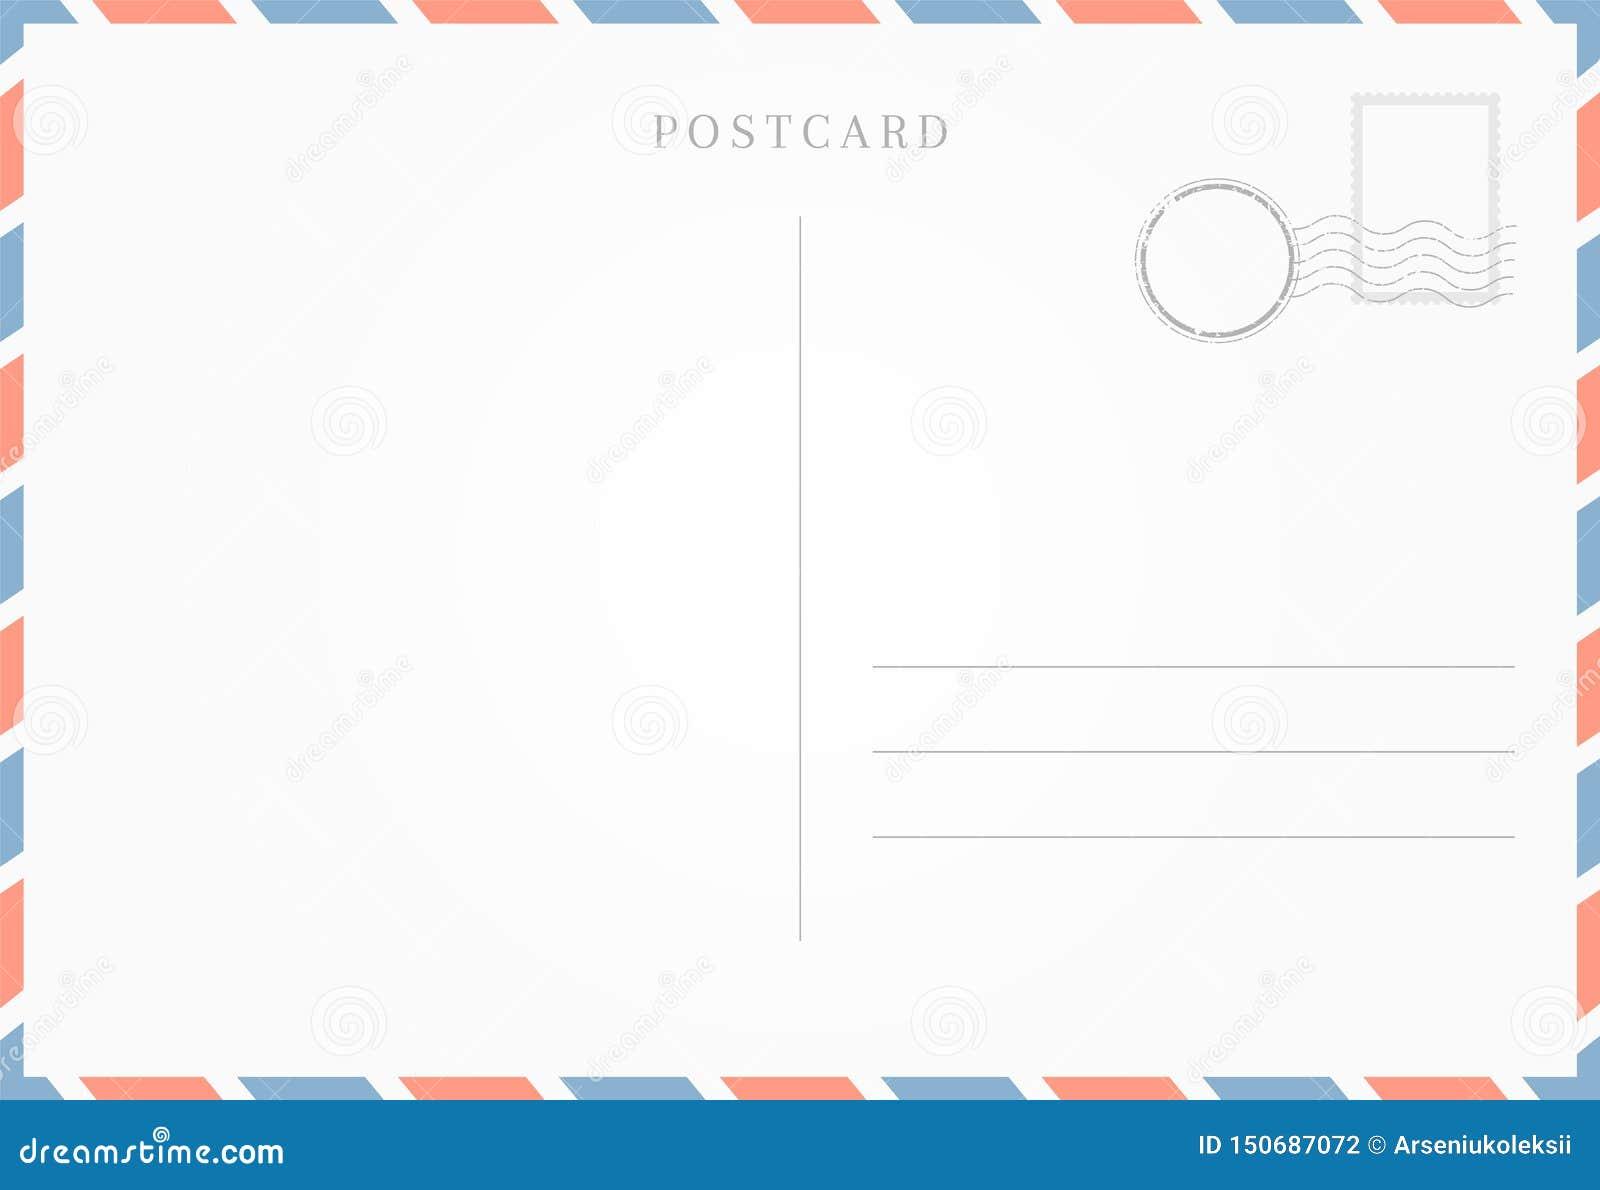 blank template of postcard backside stock vector